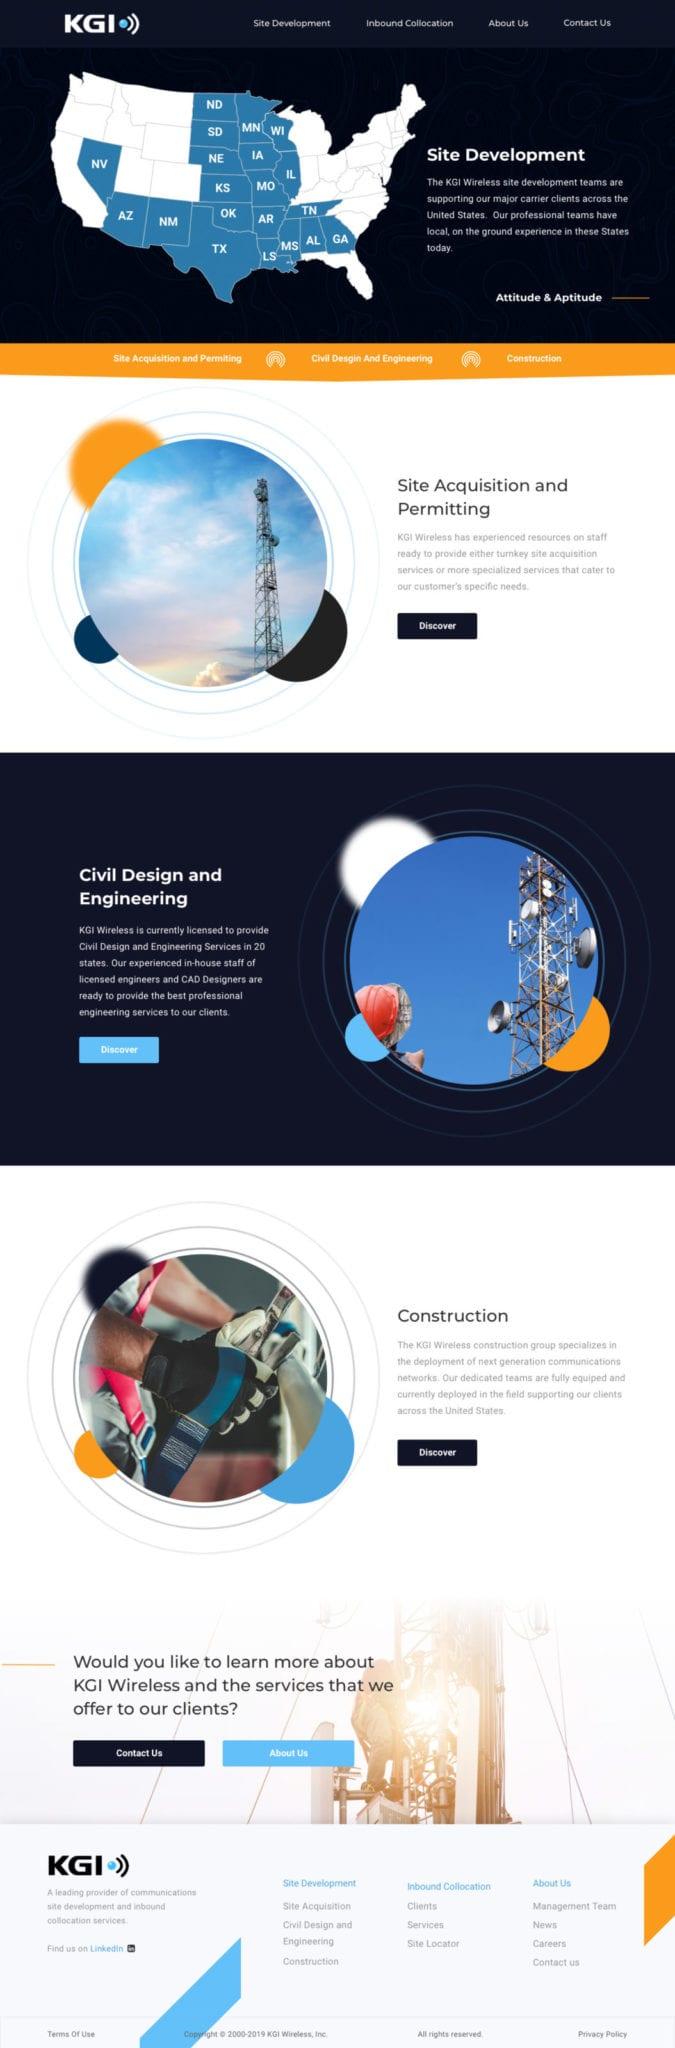 KGI Wireless Custom WordPress Website